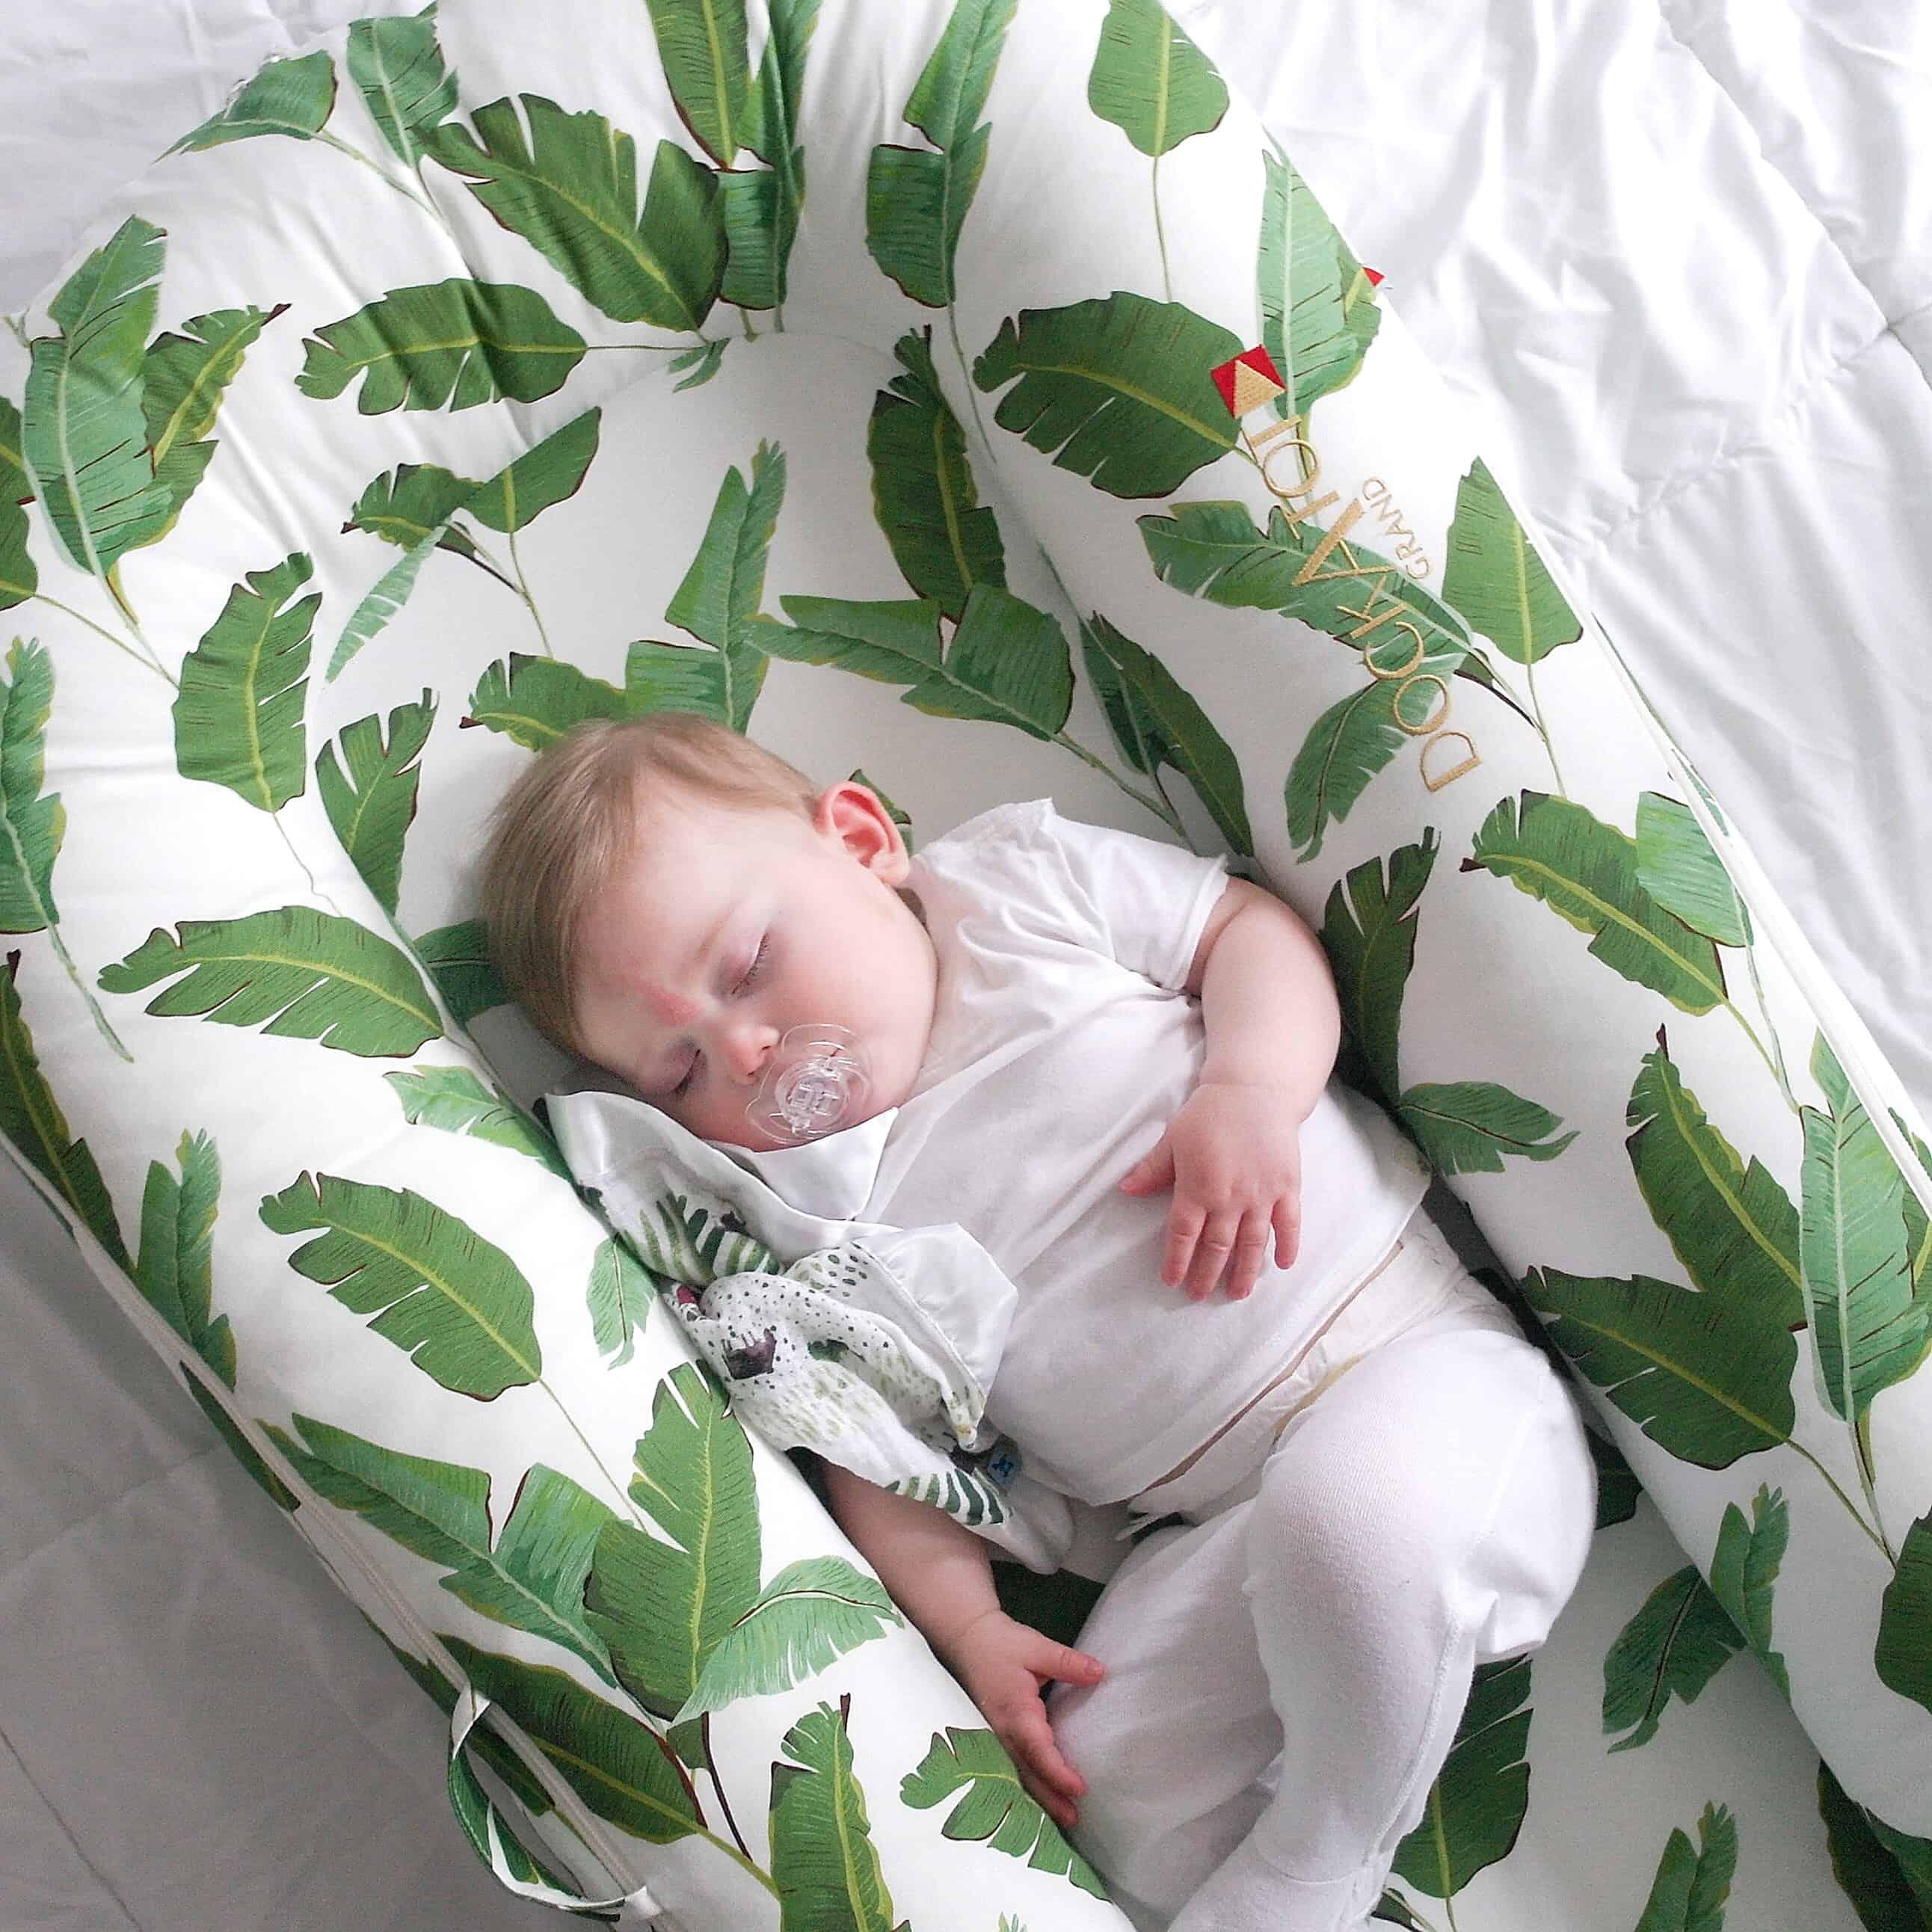 baby sleeping in dock a tot grand